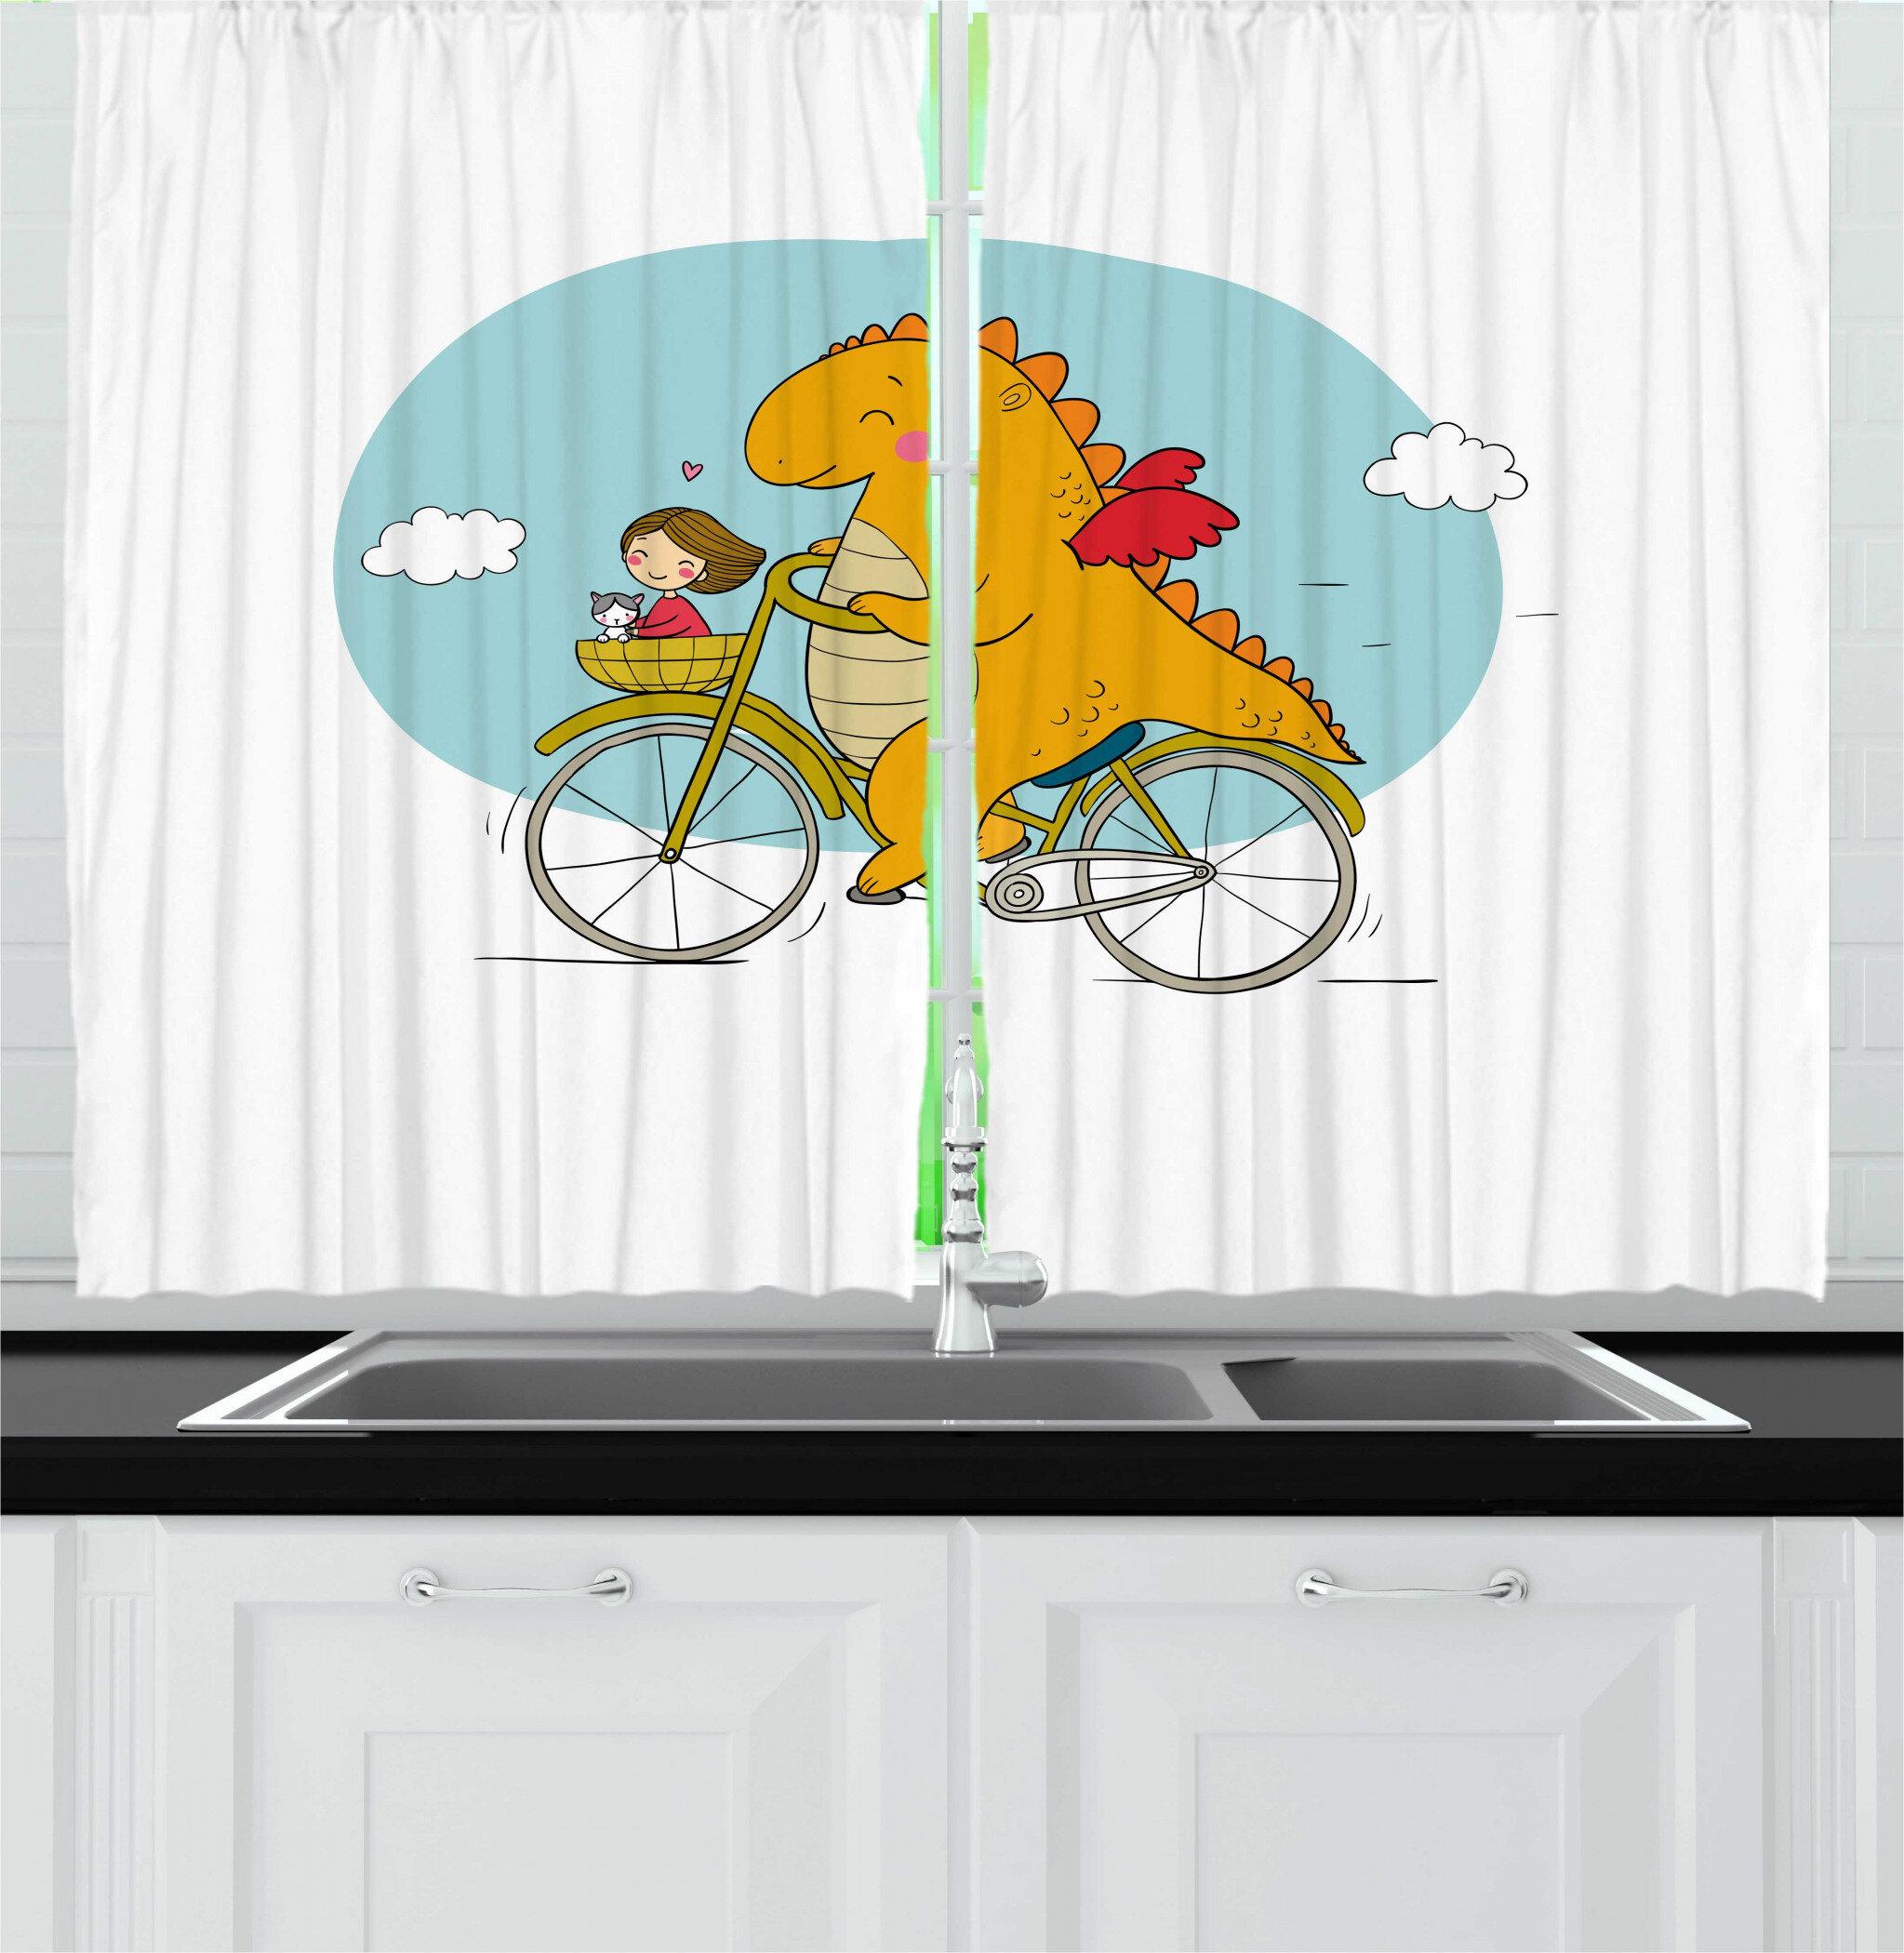 East Urban Home 2 Piece Dinosaur Bicycle Happy Friendly Dragon Traveler With A Girl And A Cat Nursery Cartoon Print Kitchen Curtains Set Wayfair